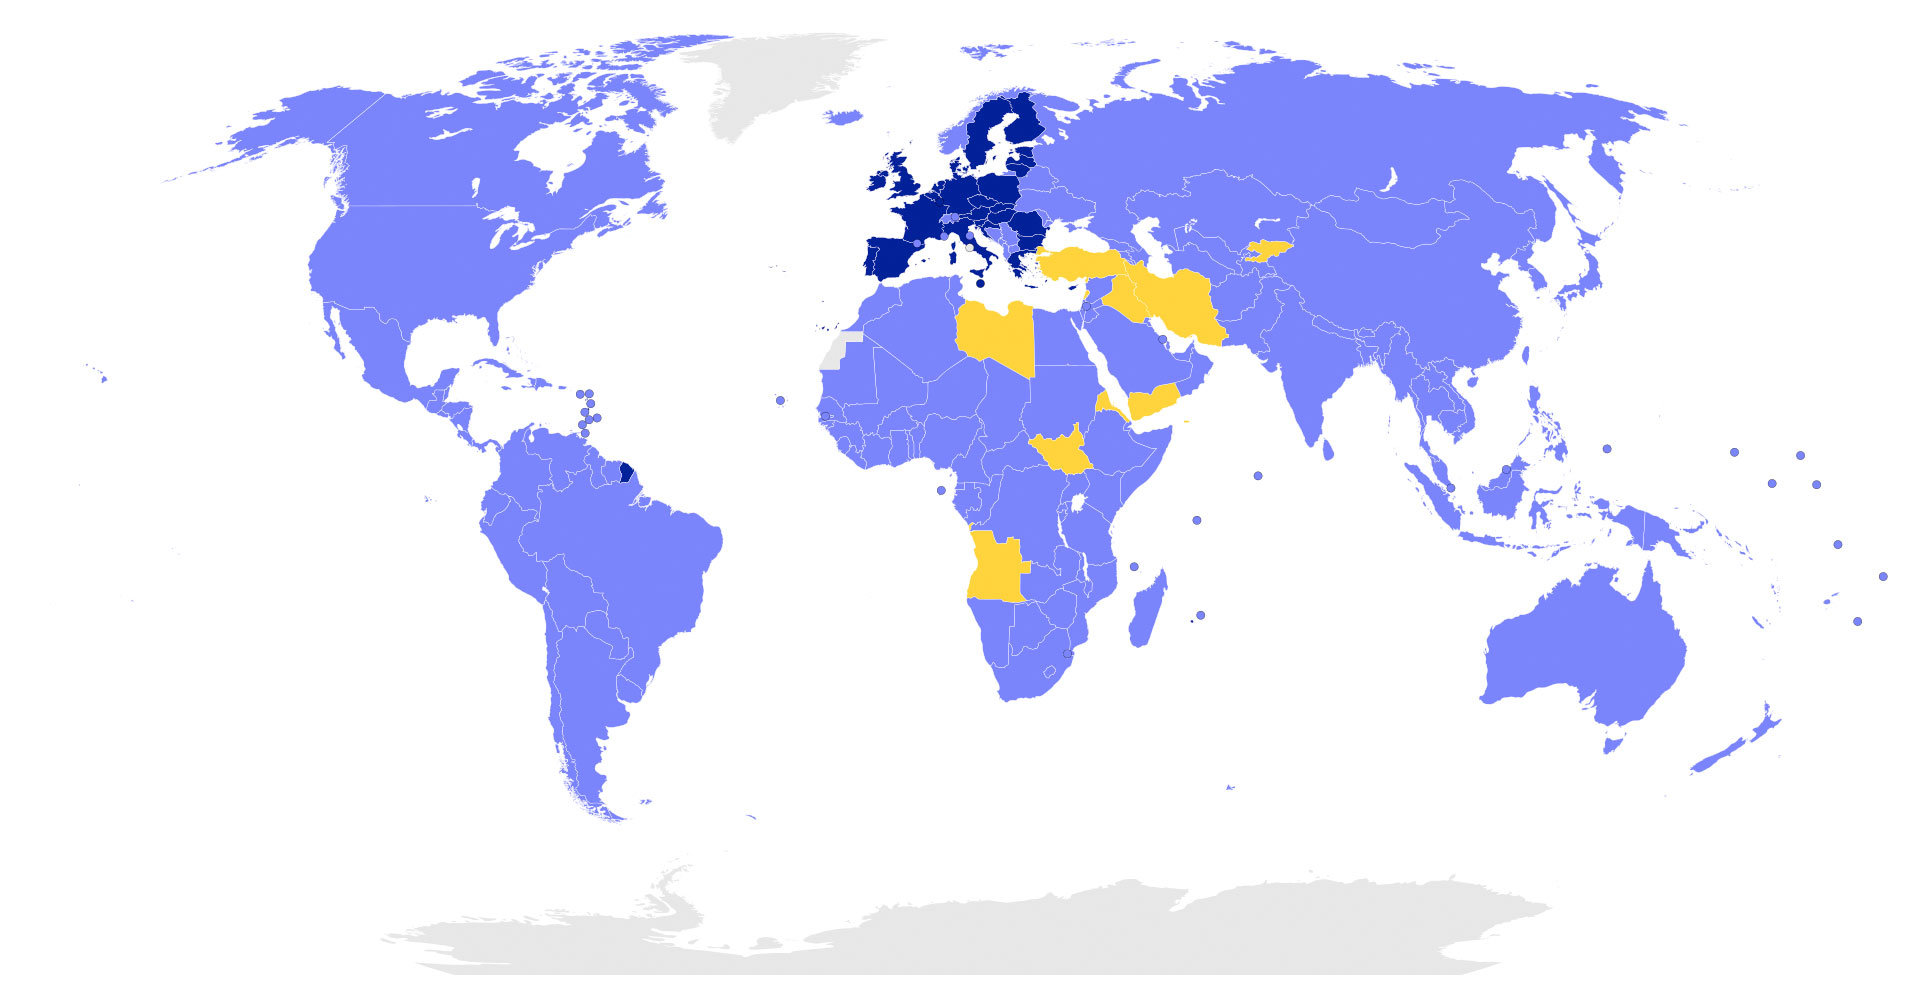 mapa mundi del acuerdo de paris